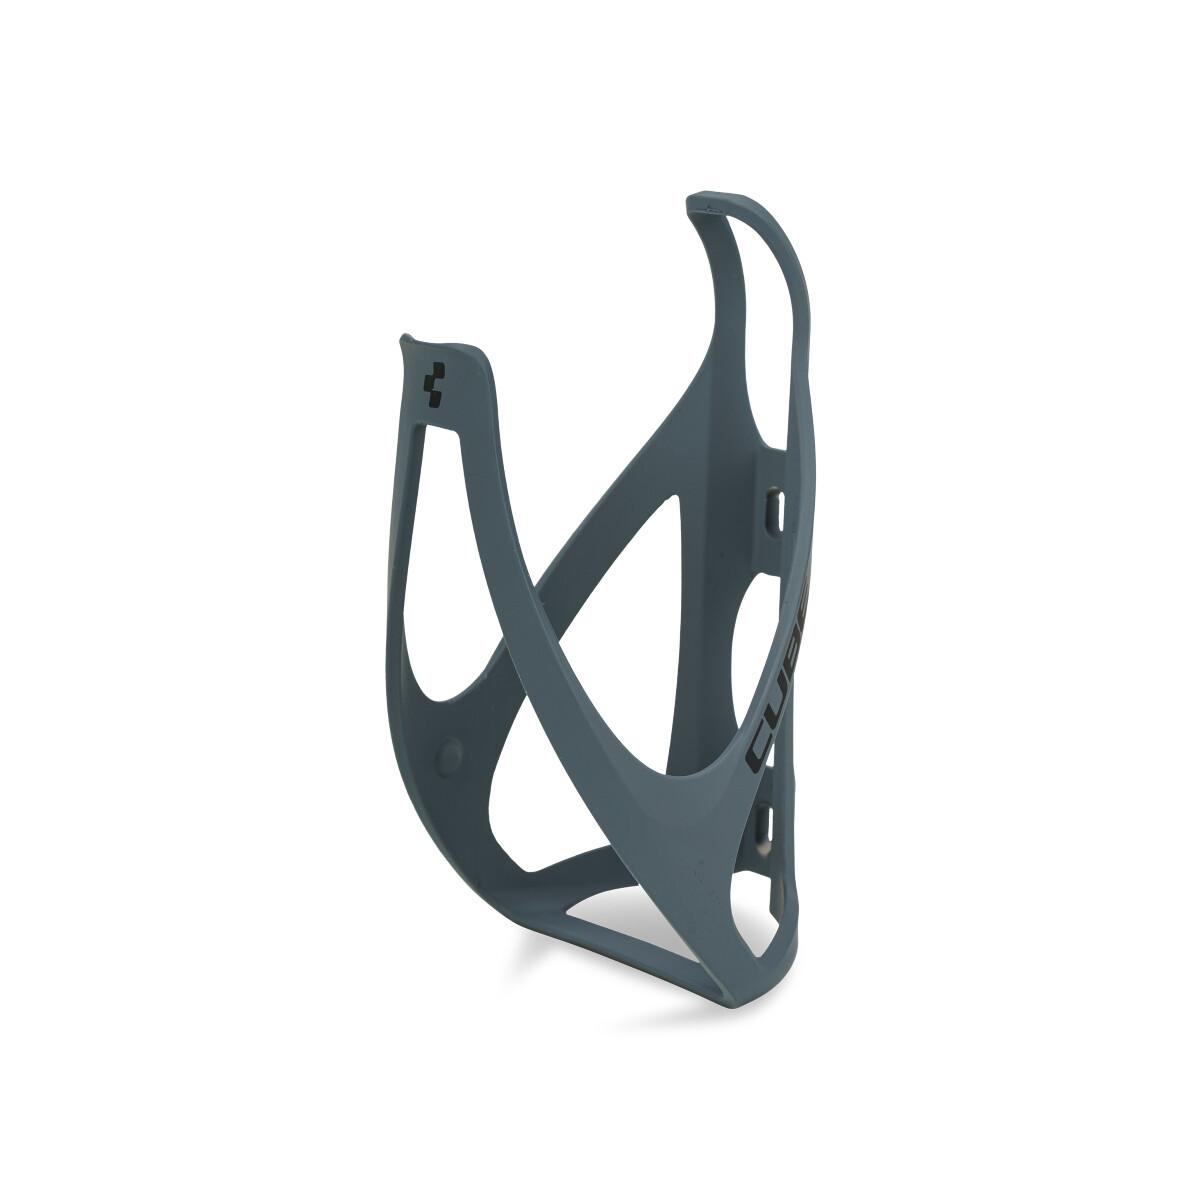 Https Always 10 Cube Store Prolite Seat Post Carbon 316mm Silver Flaschenhalter Hpp Matt Greynblack